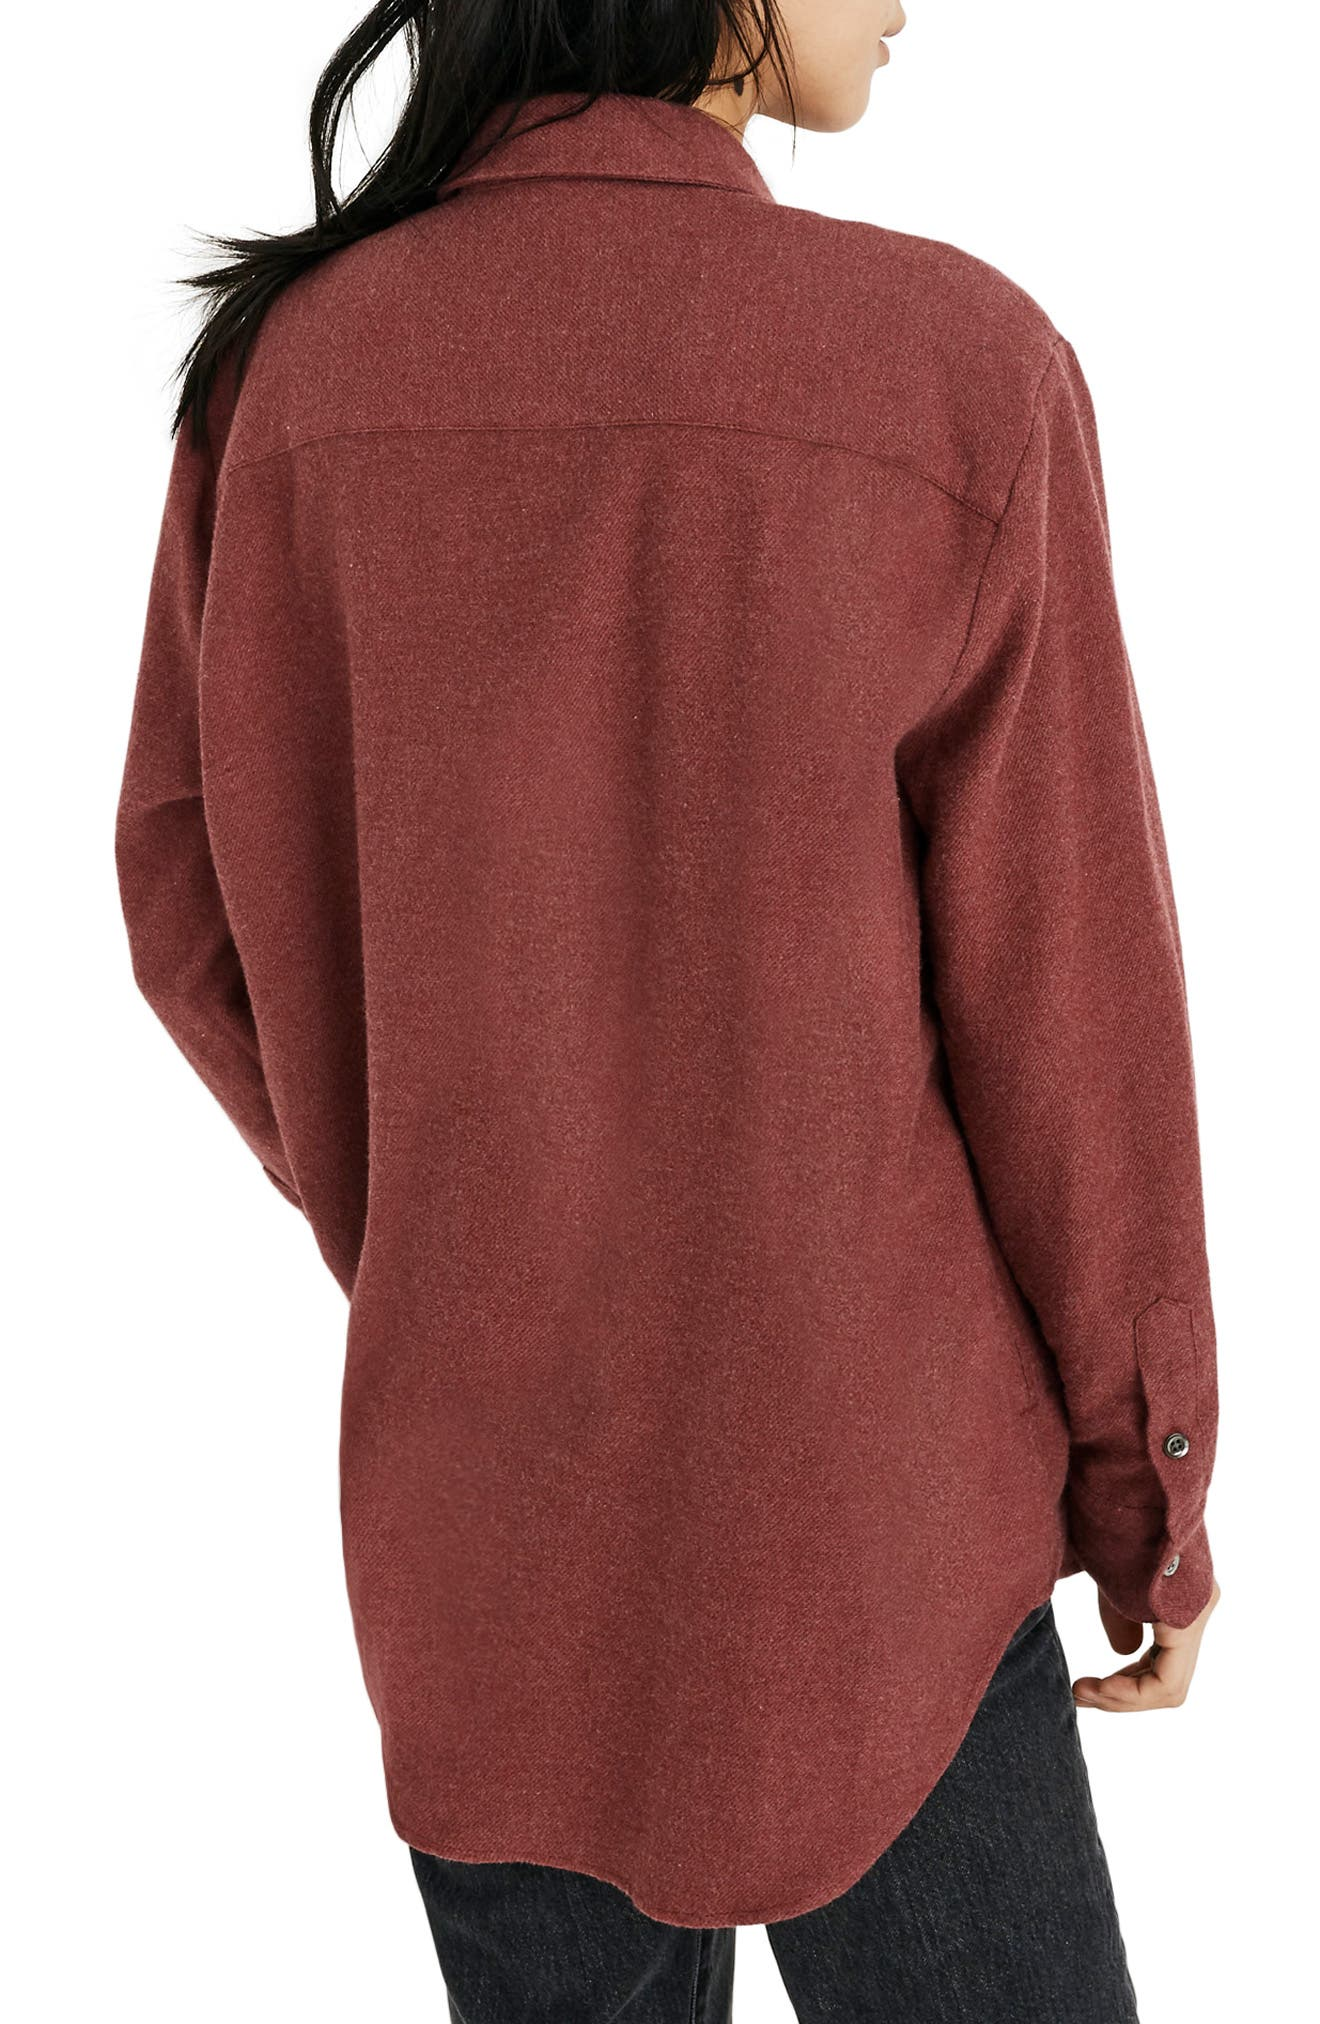 MADEWELL,                             Flannel Sunday Shirt,                             Alternate thumbnail 3, color,                             600